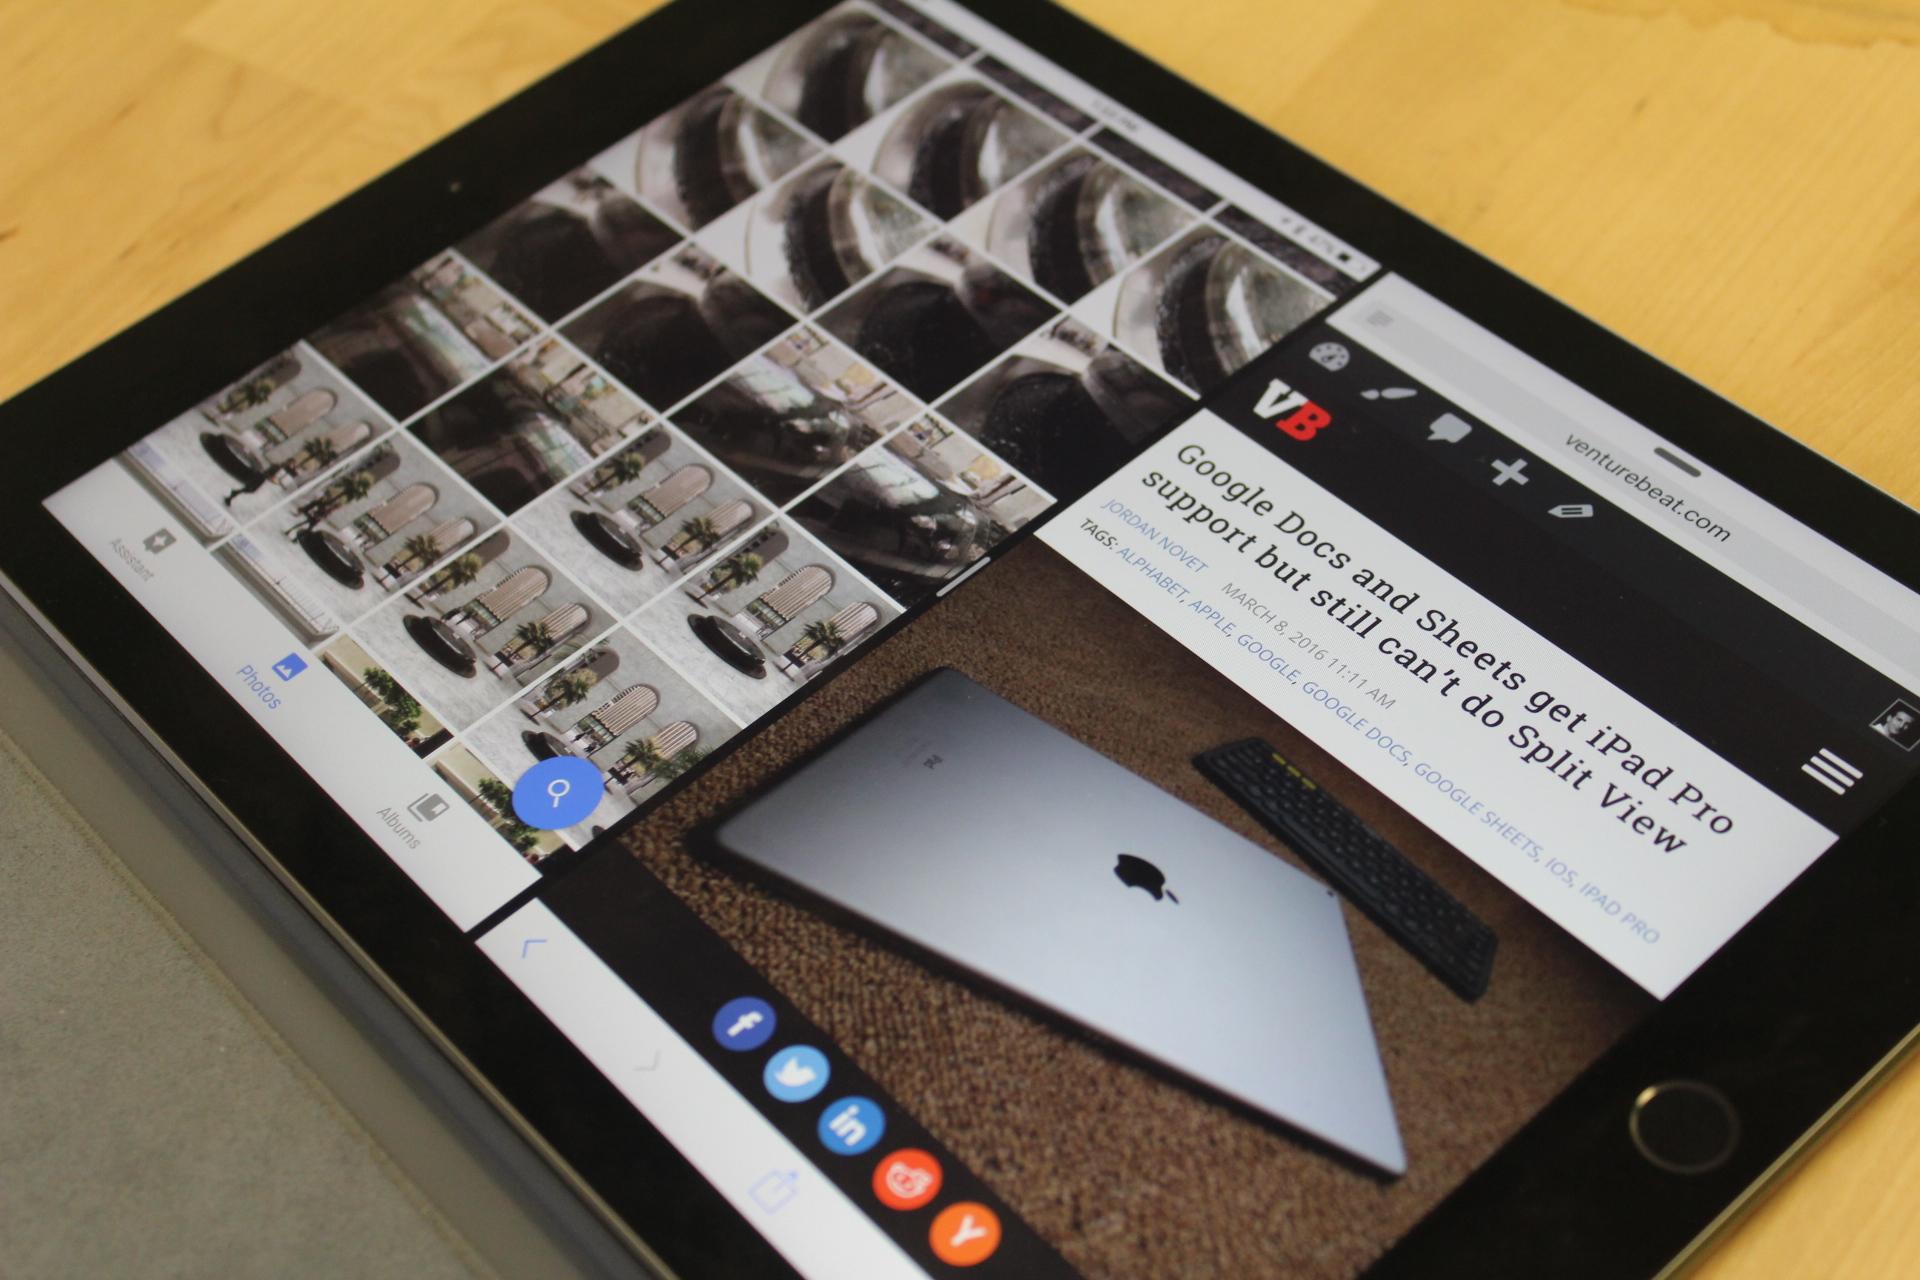 The iPad Pro in Split View.